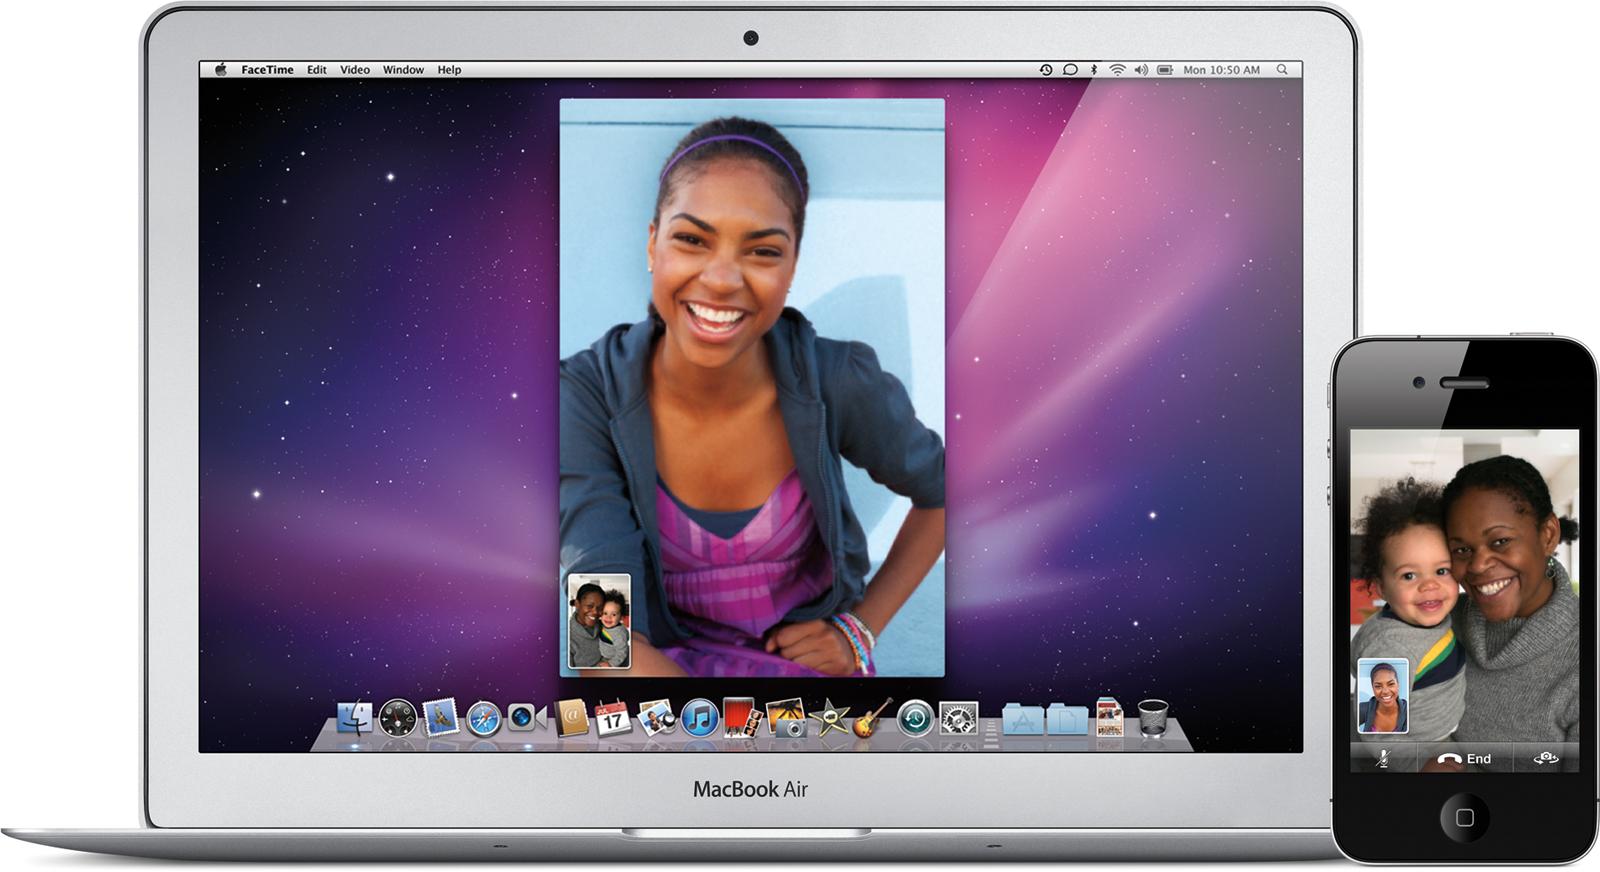 FaceTime para Mac no MacBook Air e no iPod touch 4G